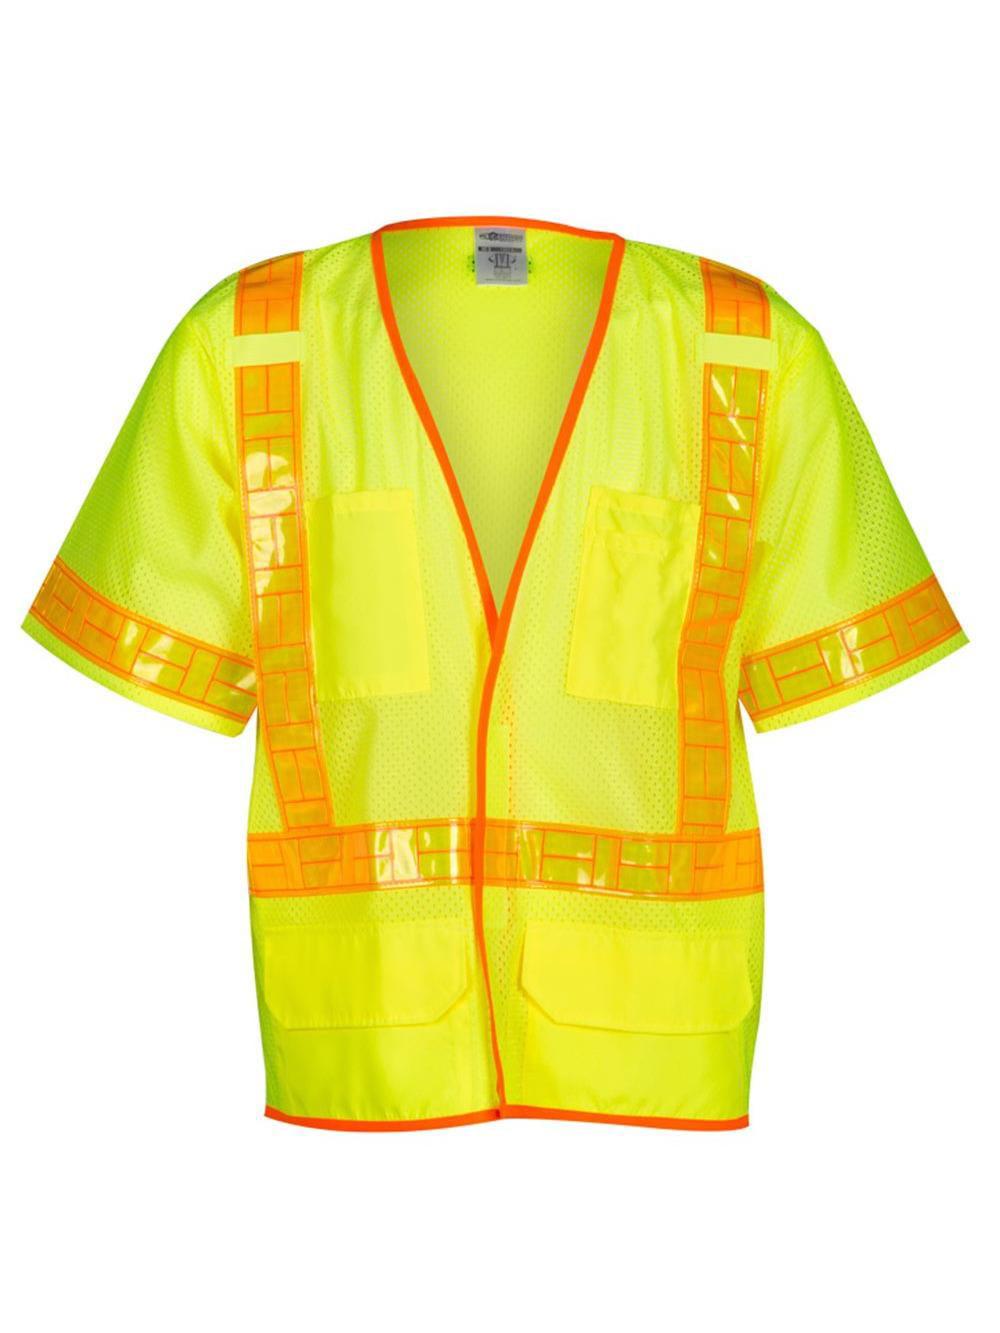 Orange/Red with Silver Stripe Traffic Vest, ANSI 3, Hook-and-Loop Closure, M